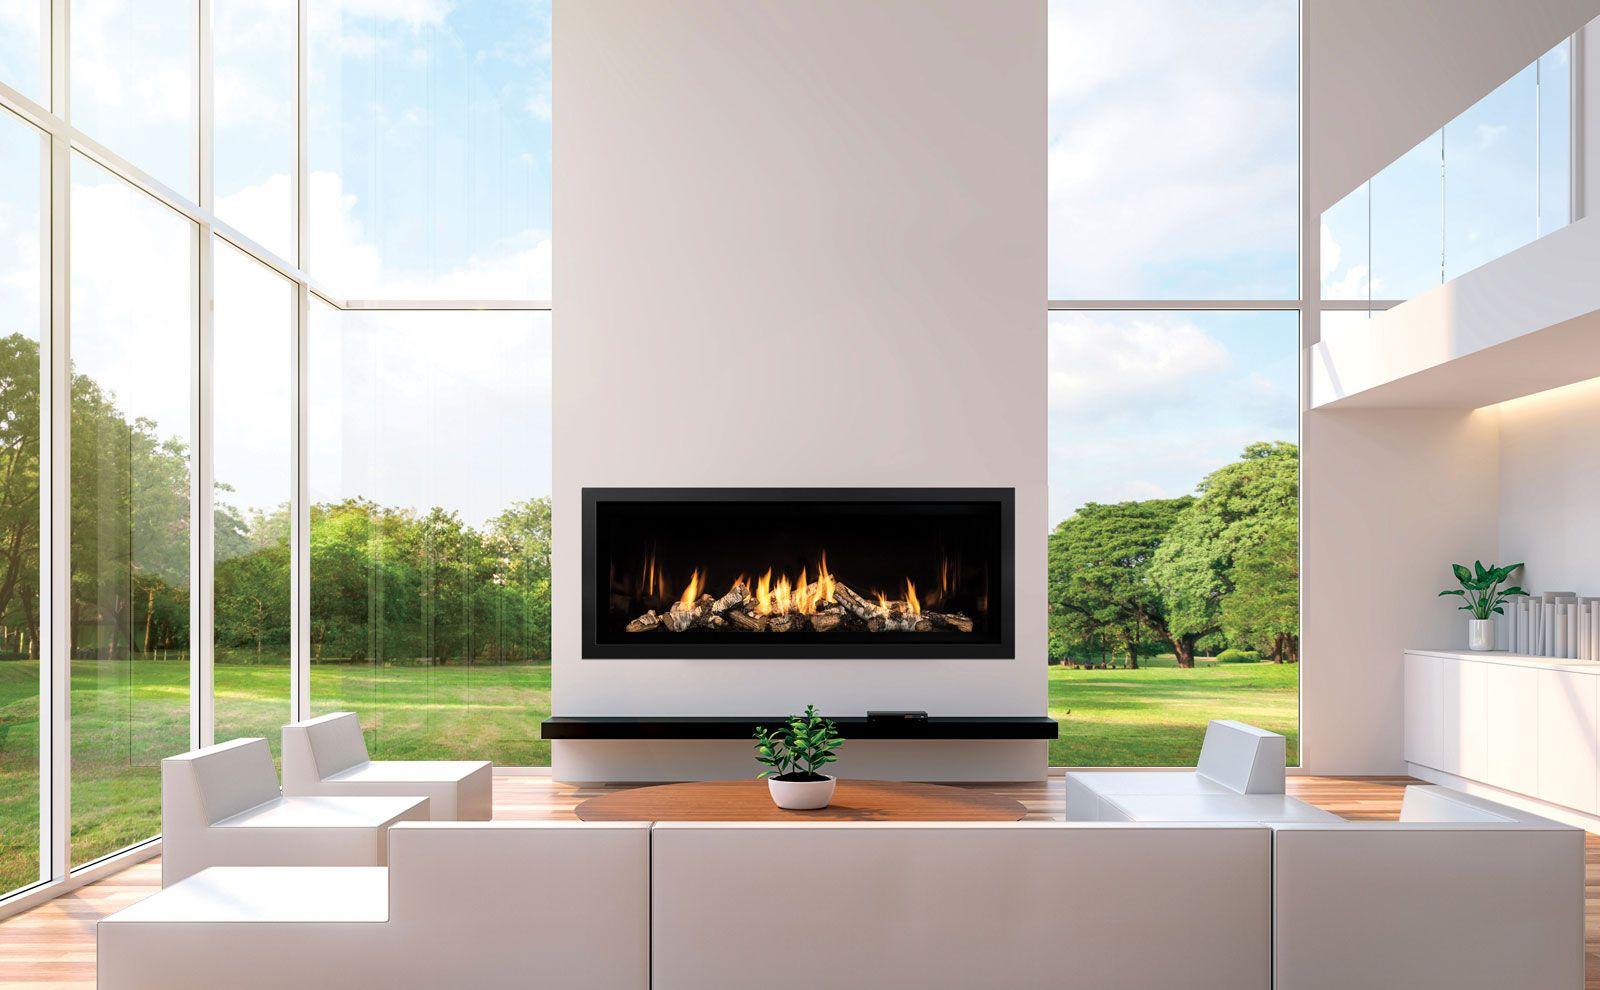 Mendota Hearth Ml54 Linear Gas Fireplace In 2020 Linear Fireplace Gas Fireplace Fireplace